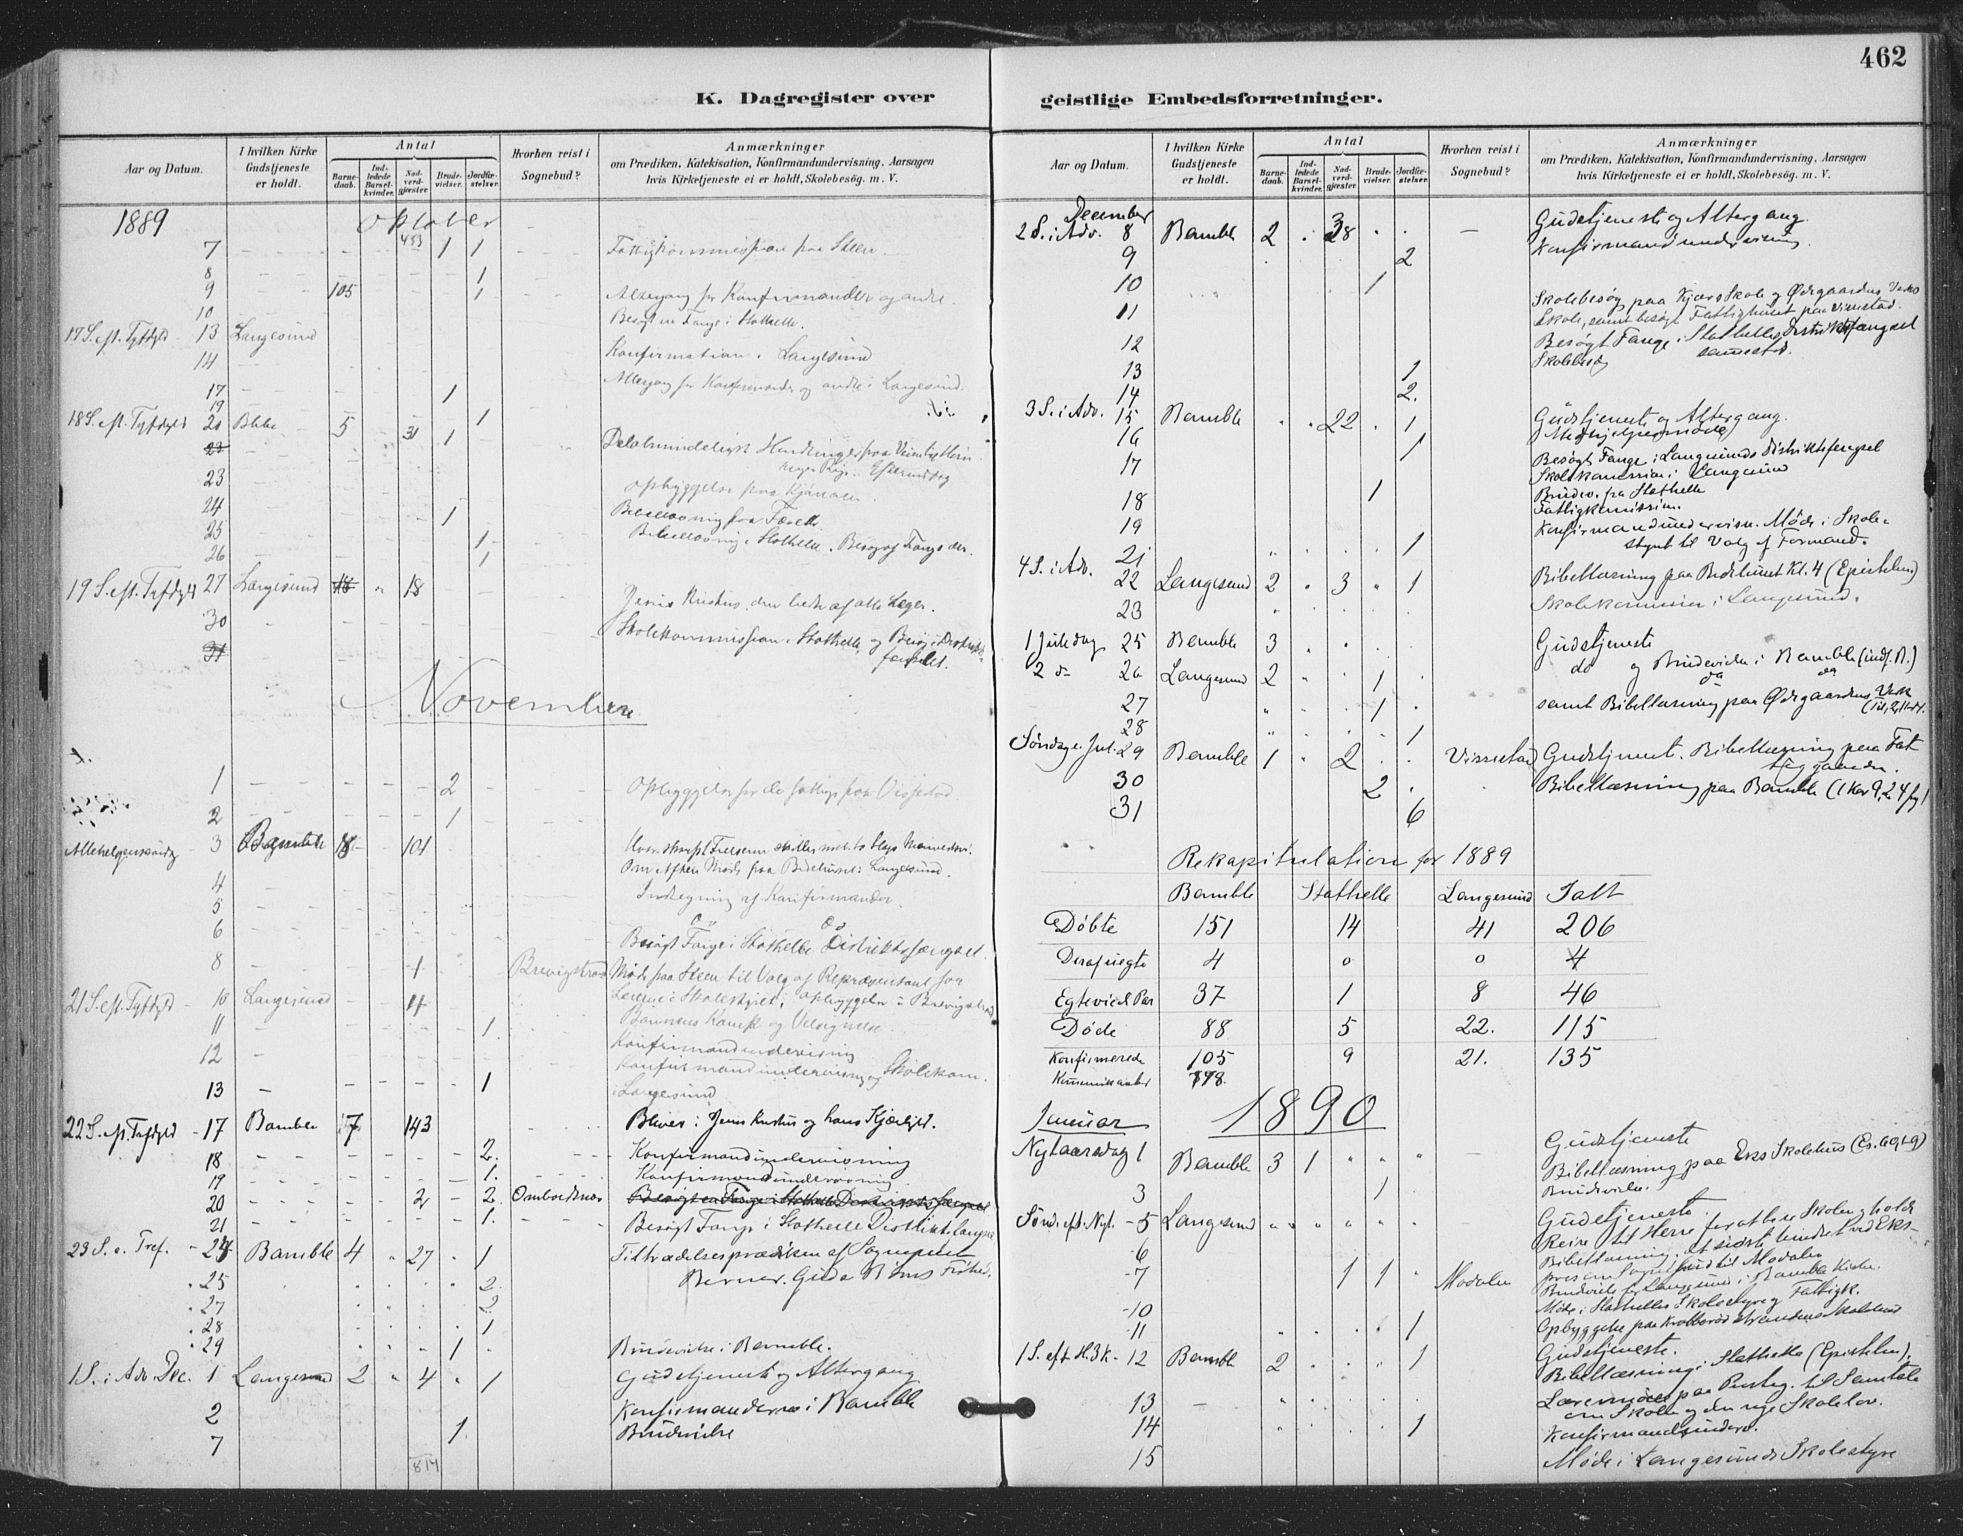 SAKO, Bamble kirkebøker, F/Fa/L0008: Ministerialbok nr. I 8, 1888-1900, s. 462